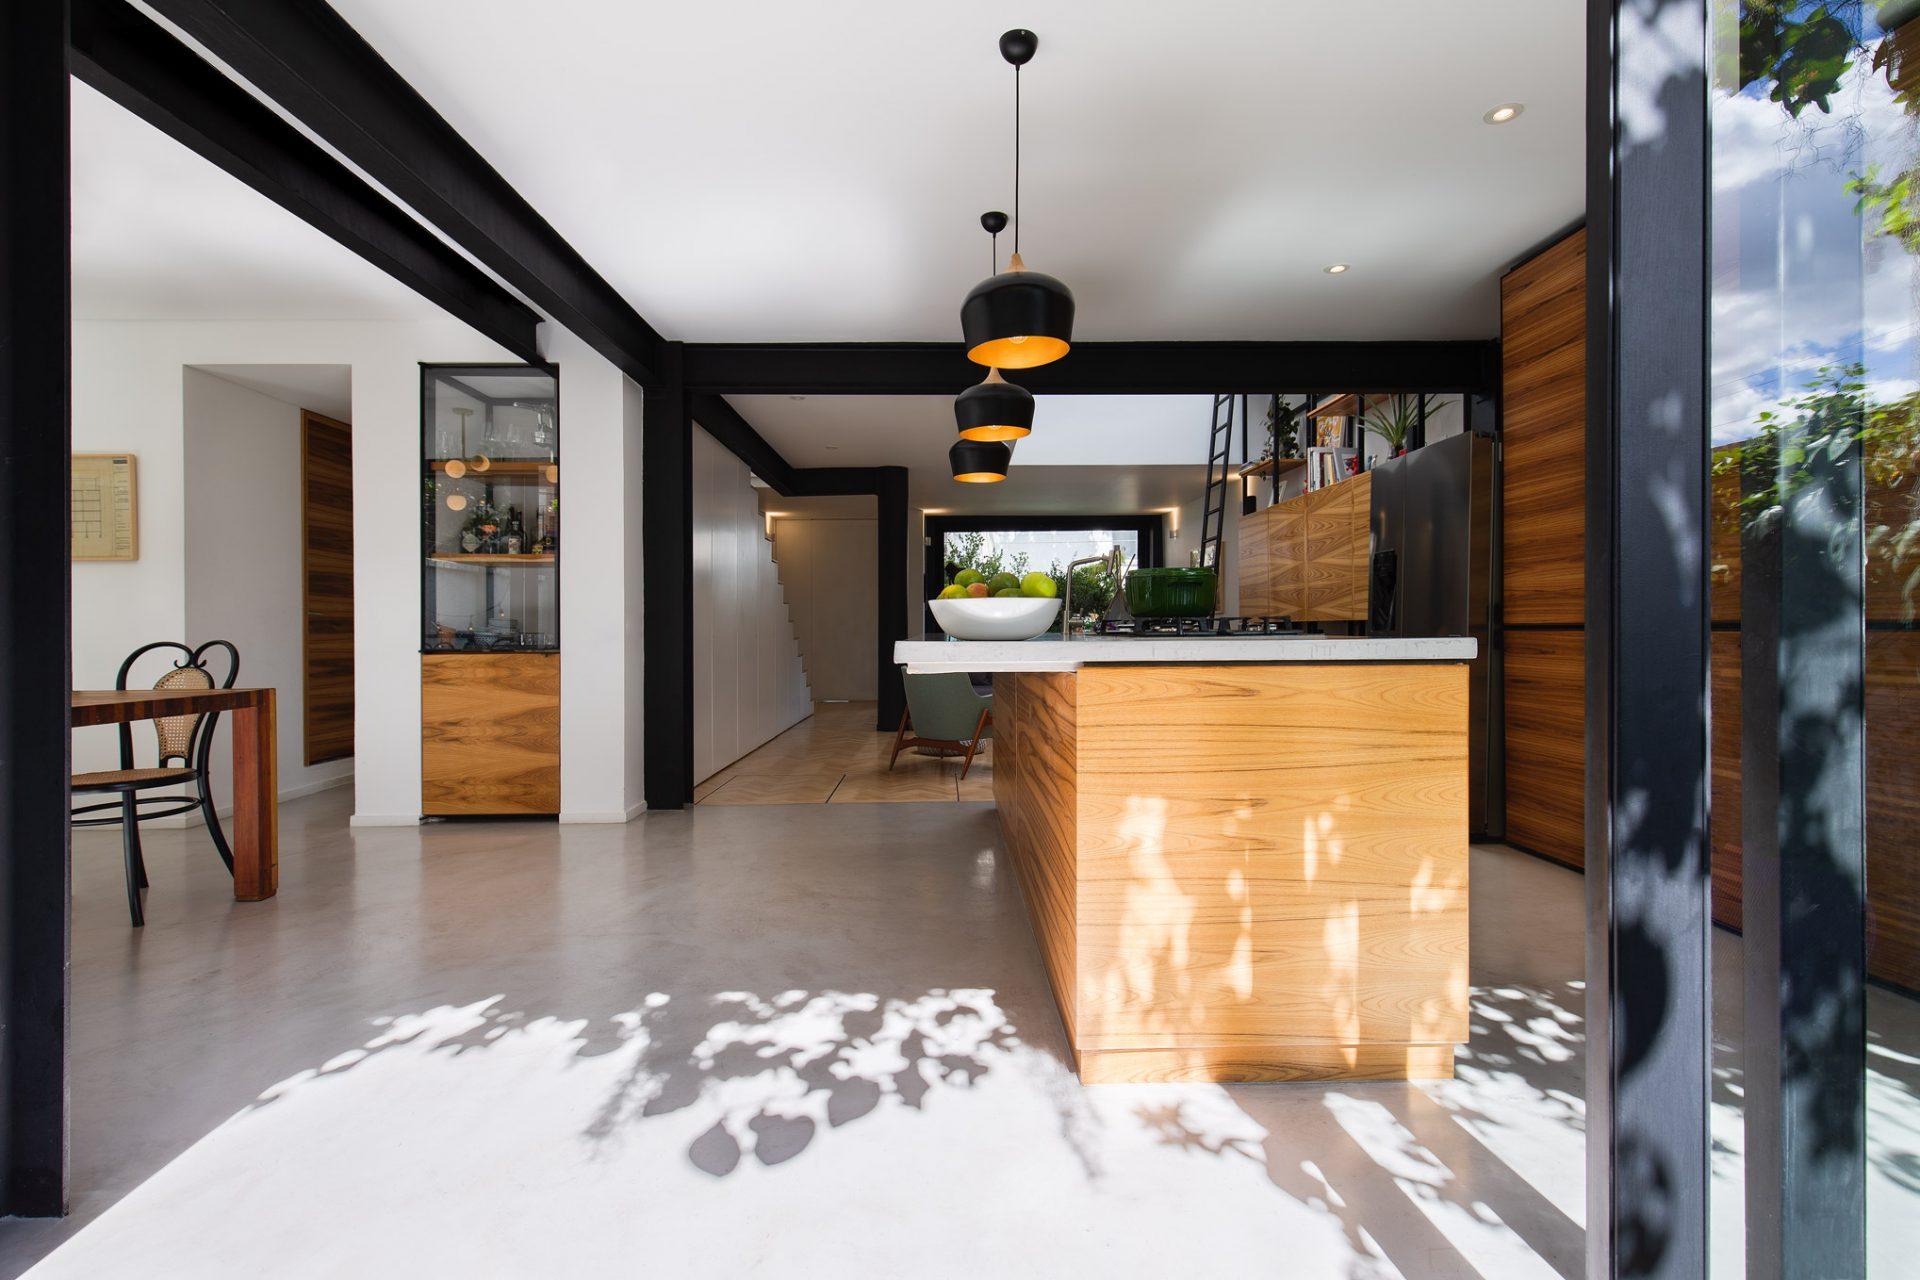 12.oberlaenderarquitectos.arquitectura.simonboschphotography.simon.bosch.bogota.interior.habitar